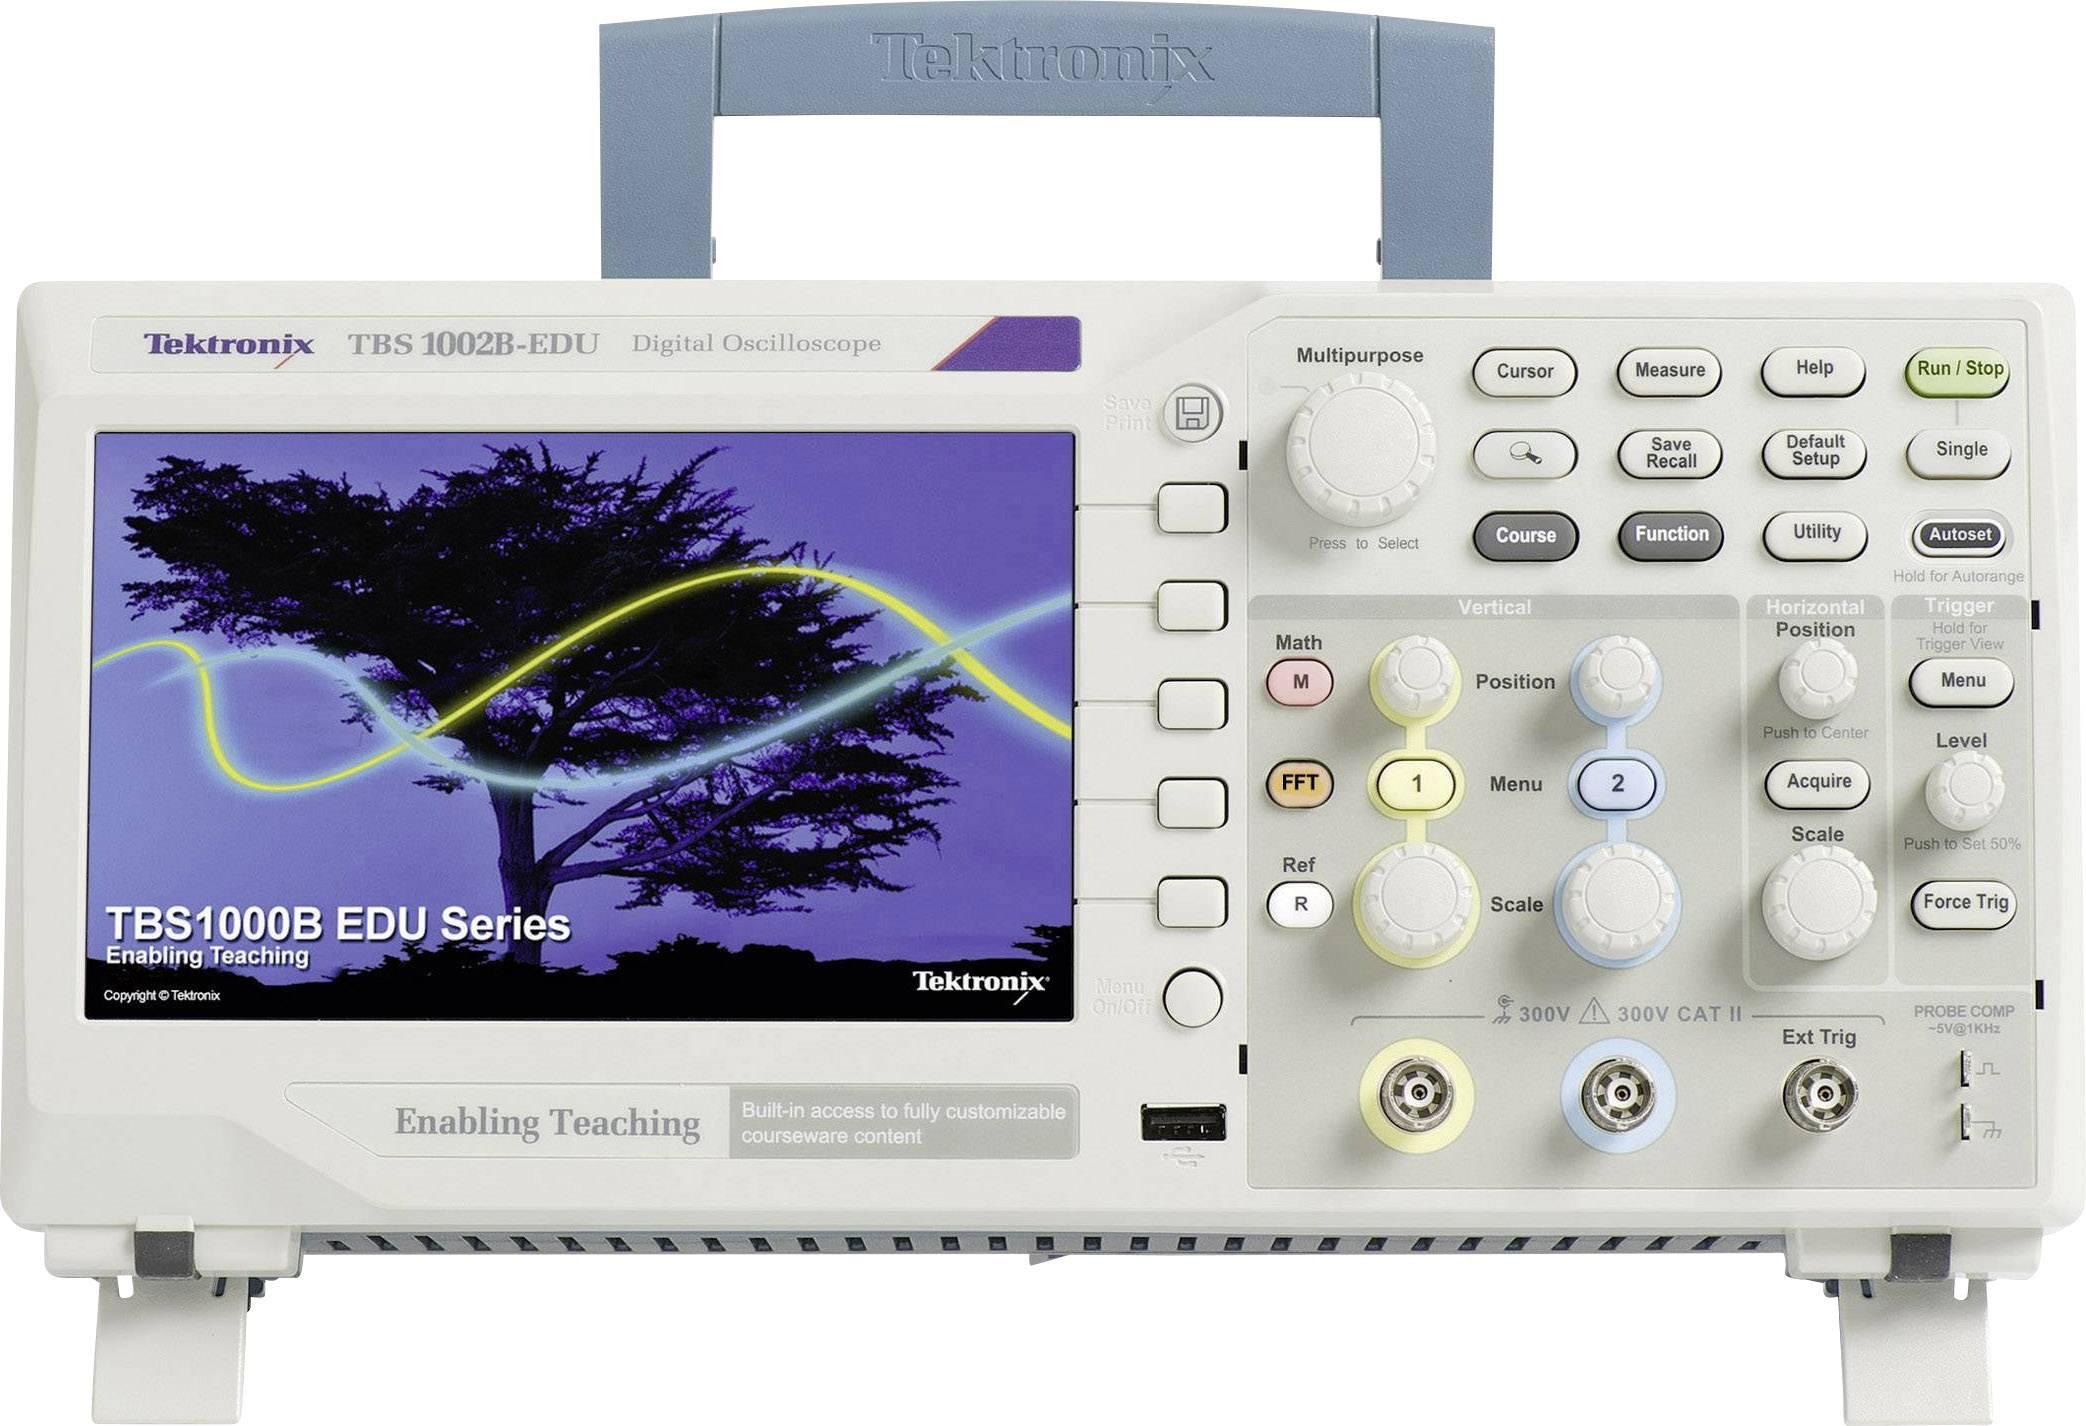 Digitálny osciloskop Tektronix TBS1152B-EDU, 150 MHz, 2-kanálový, kalibrácia podľa ISO